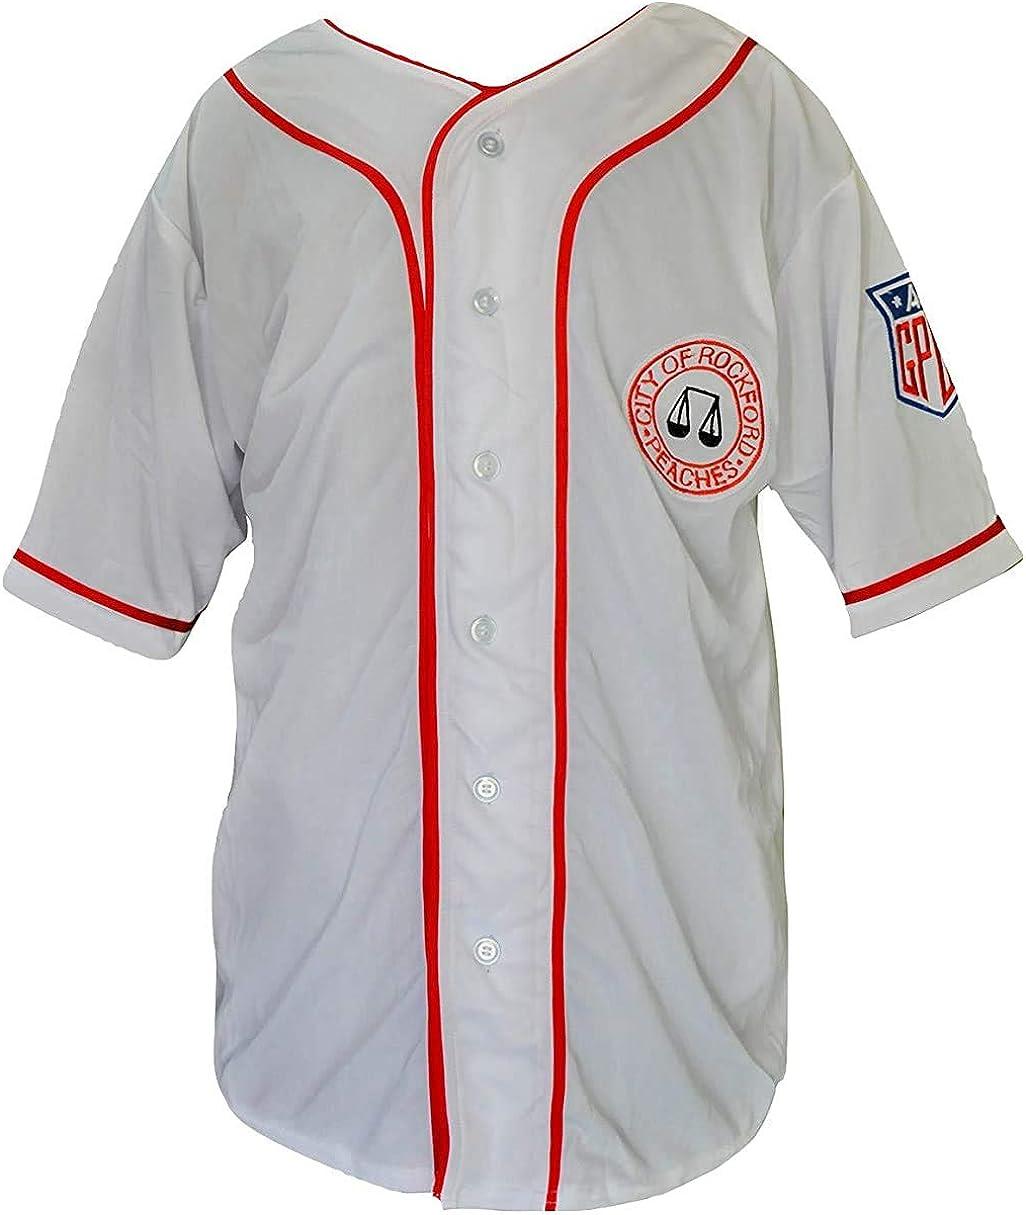 borizcustoms Hanks 毎日がバーゲンセール Jimmy Dugan 正規取扱店 Jersey Stitch Sewn Baseball